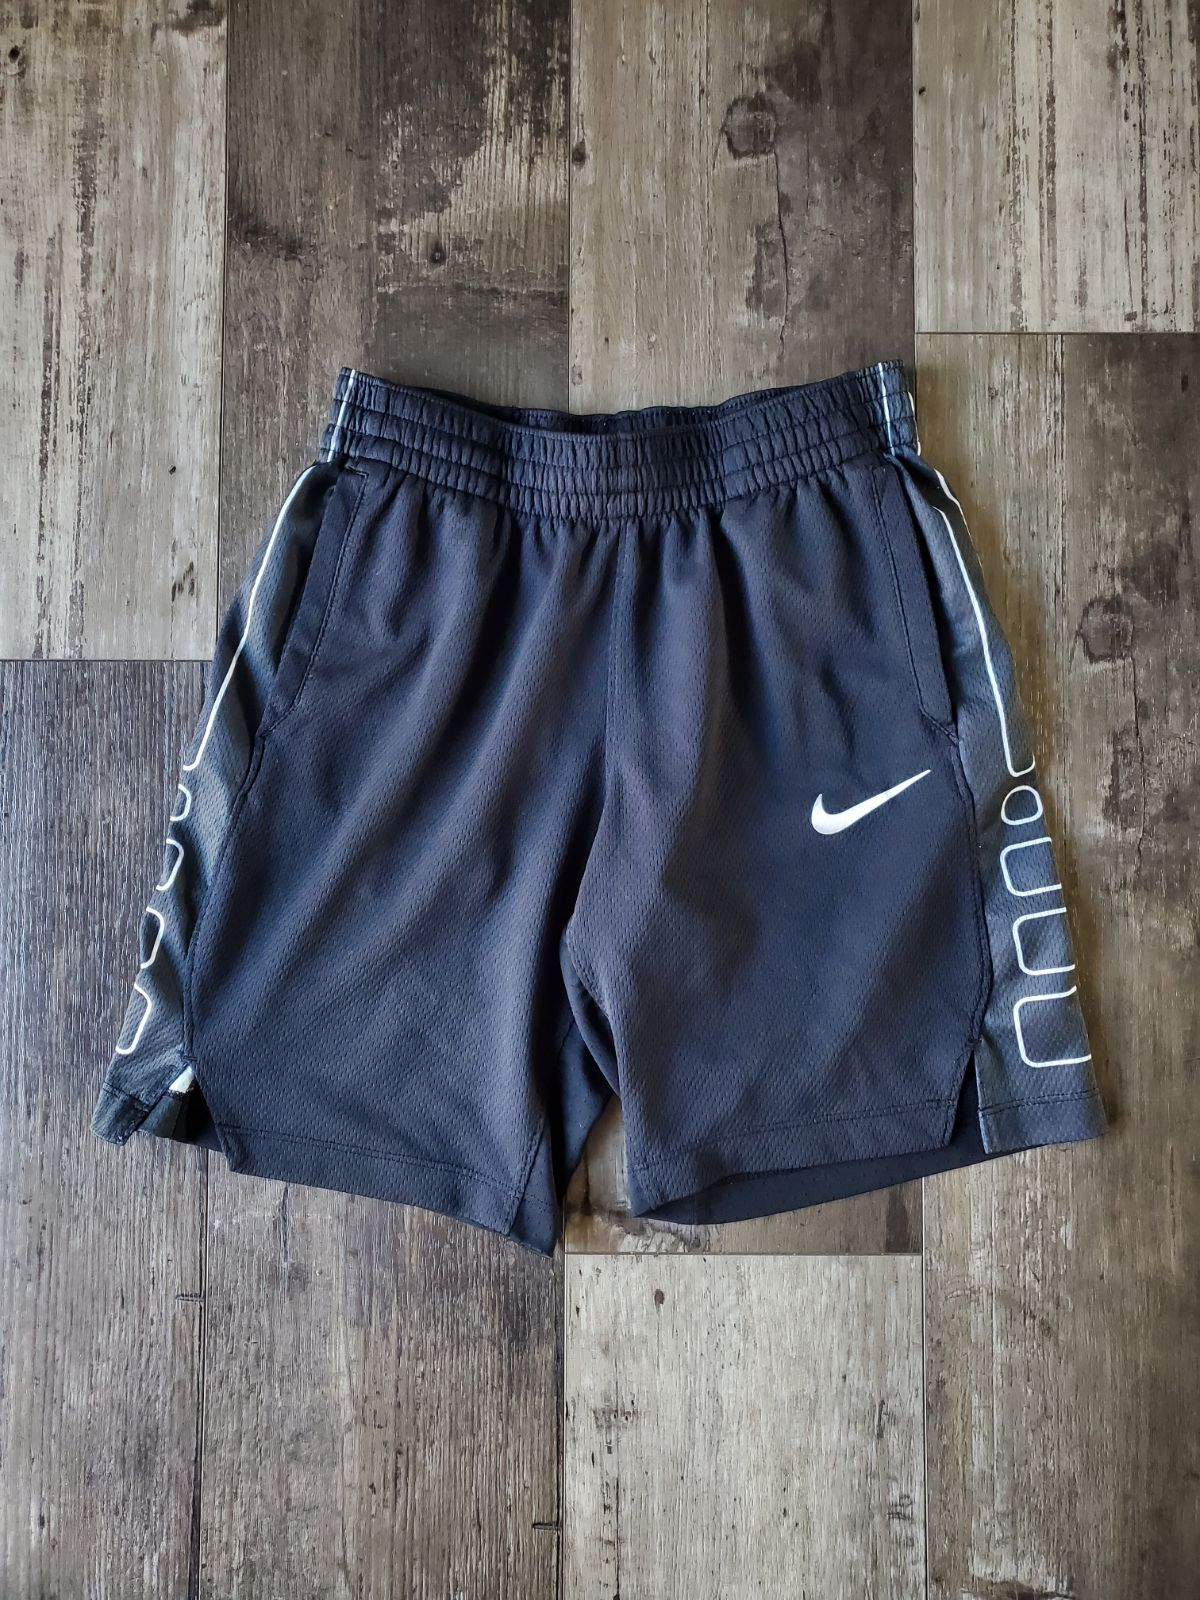 Nike Shorts L On Mercari Boys Nike Shorts Nike Shorts Shoes With Jeans